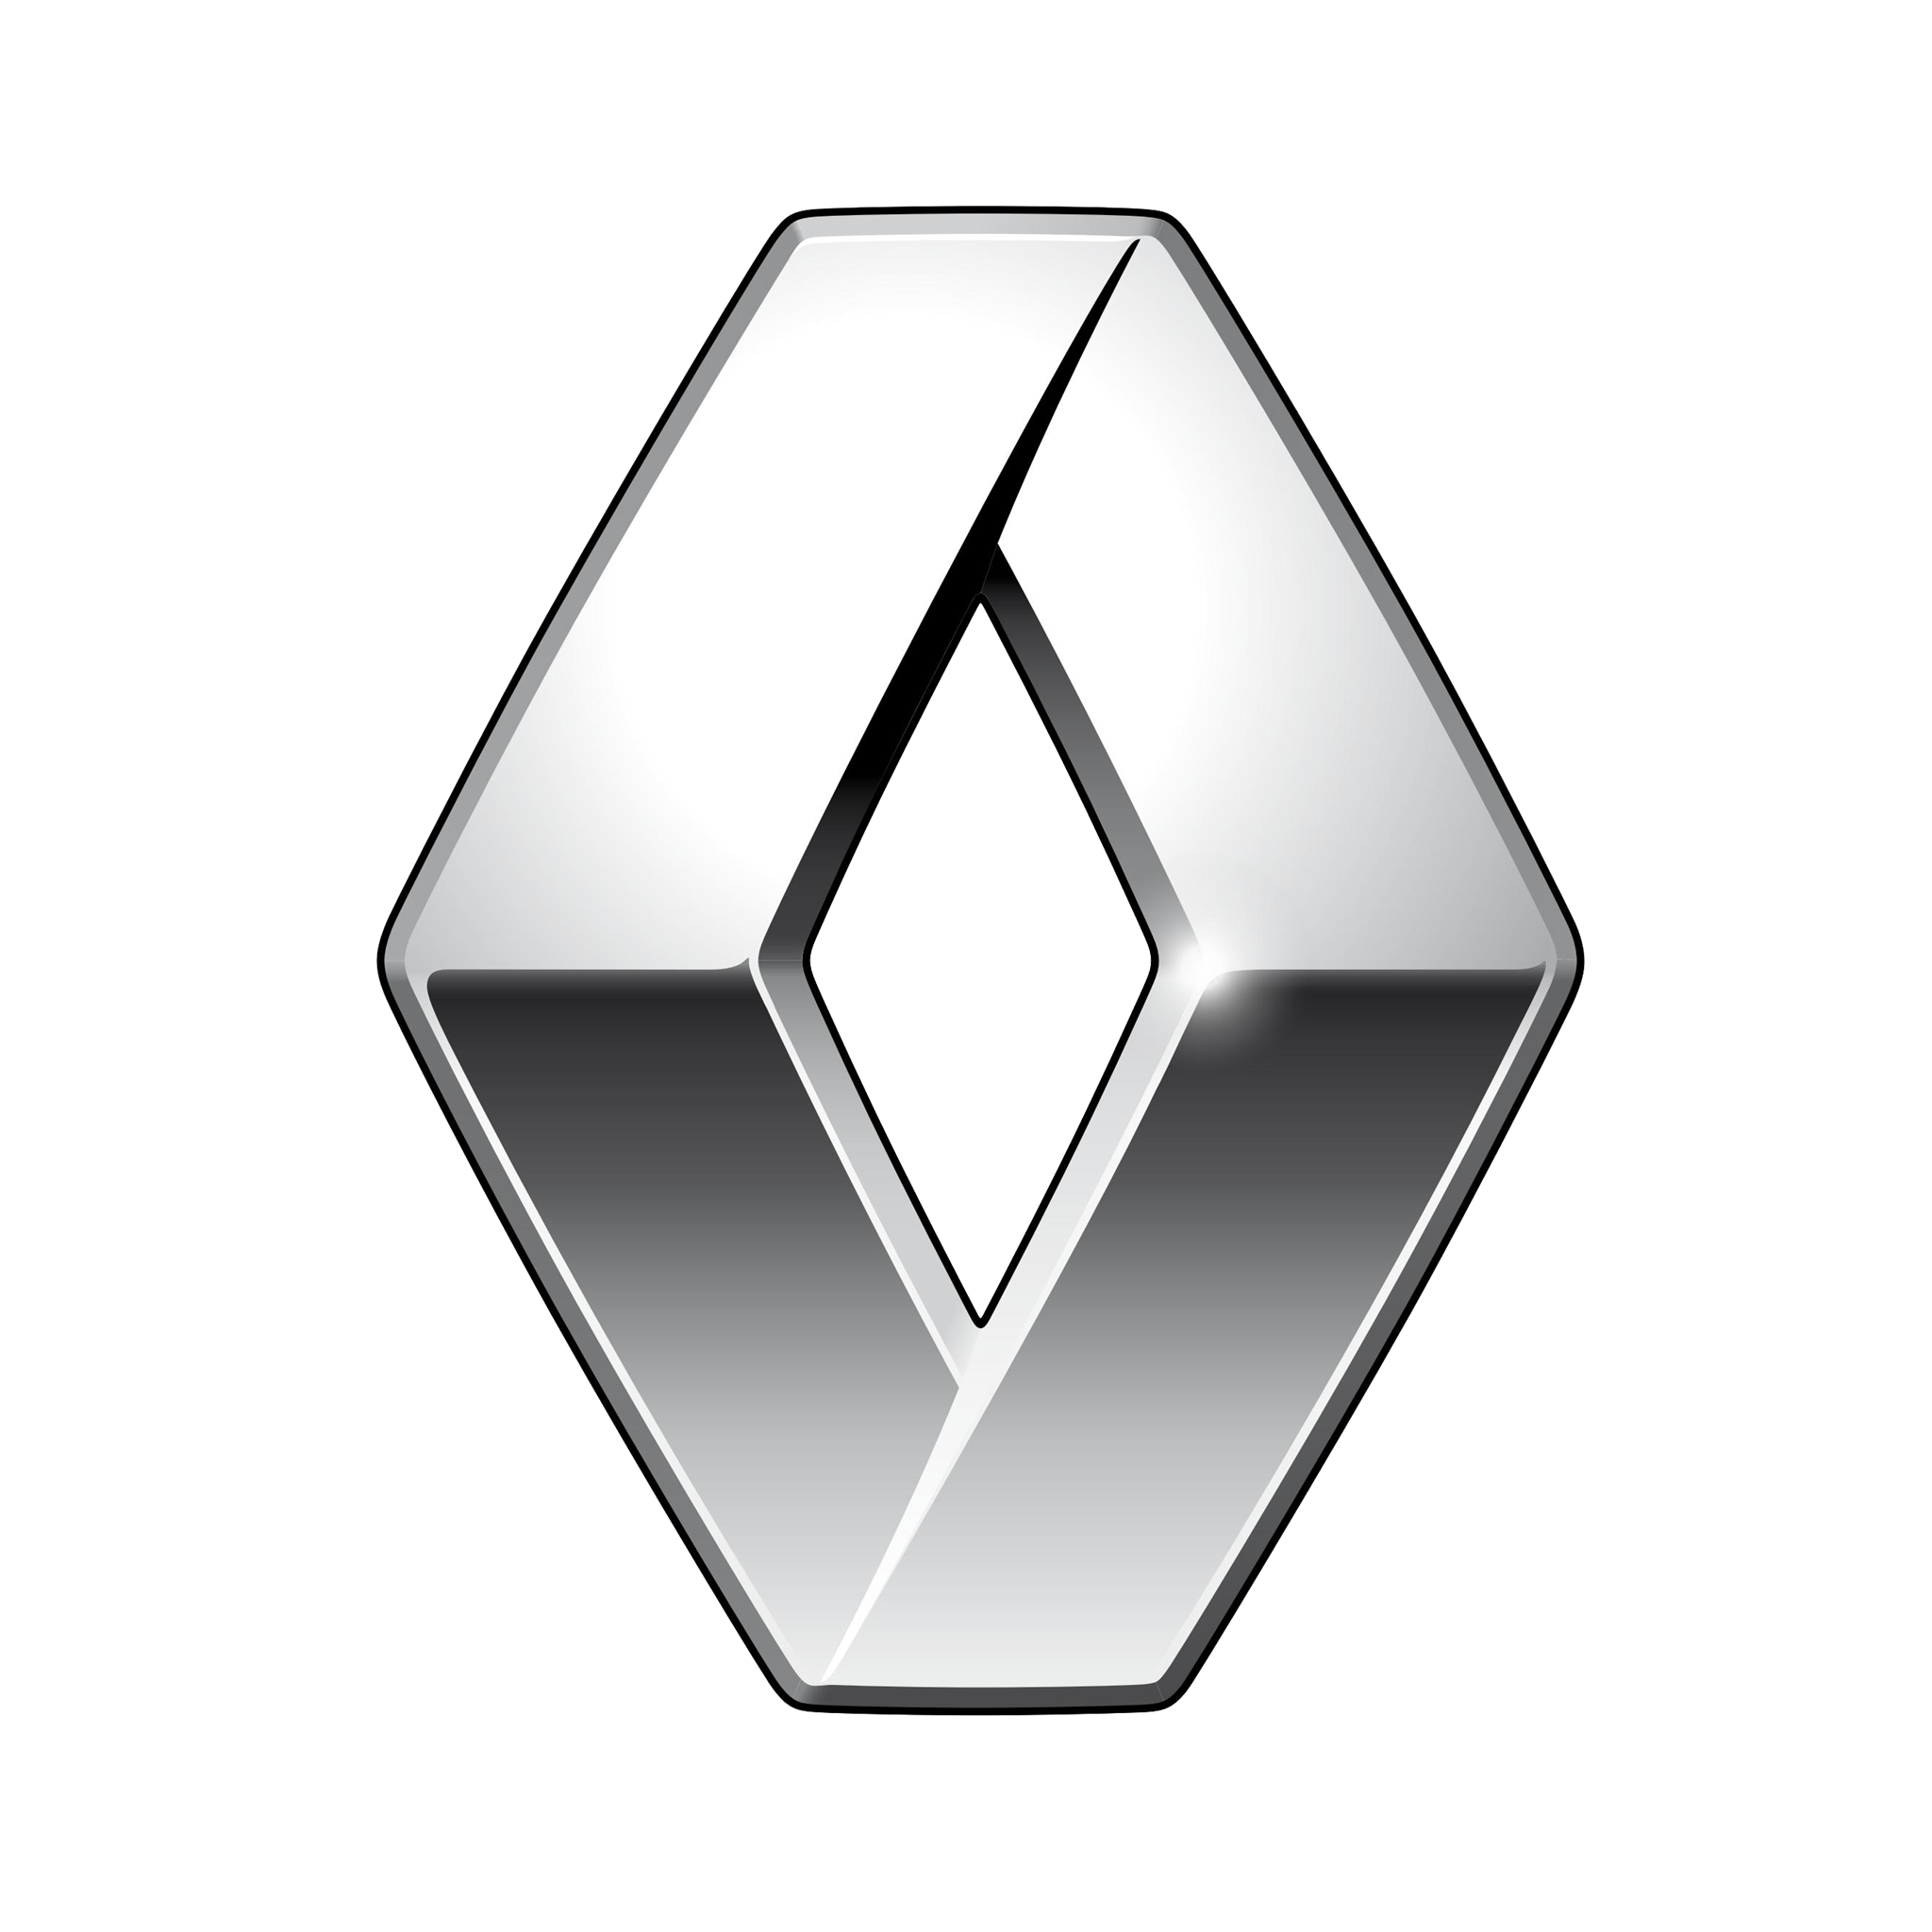 Renault logo clipart clip transparent library Renault Logo PNG Image - PurePNG | Free transparent CC0 PNG ... clip transparent library